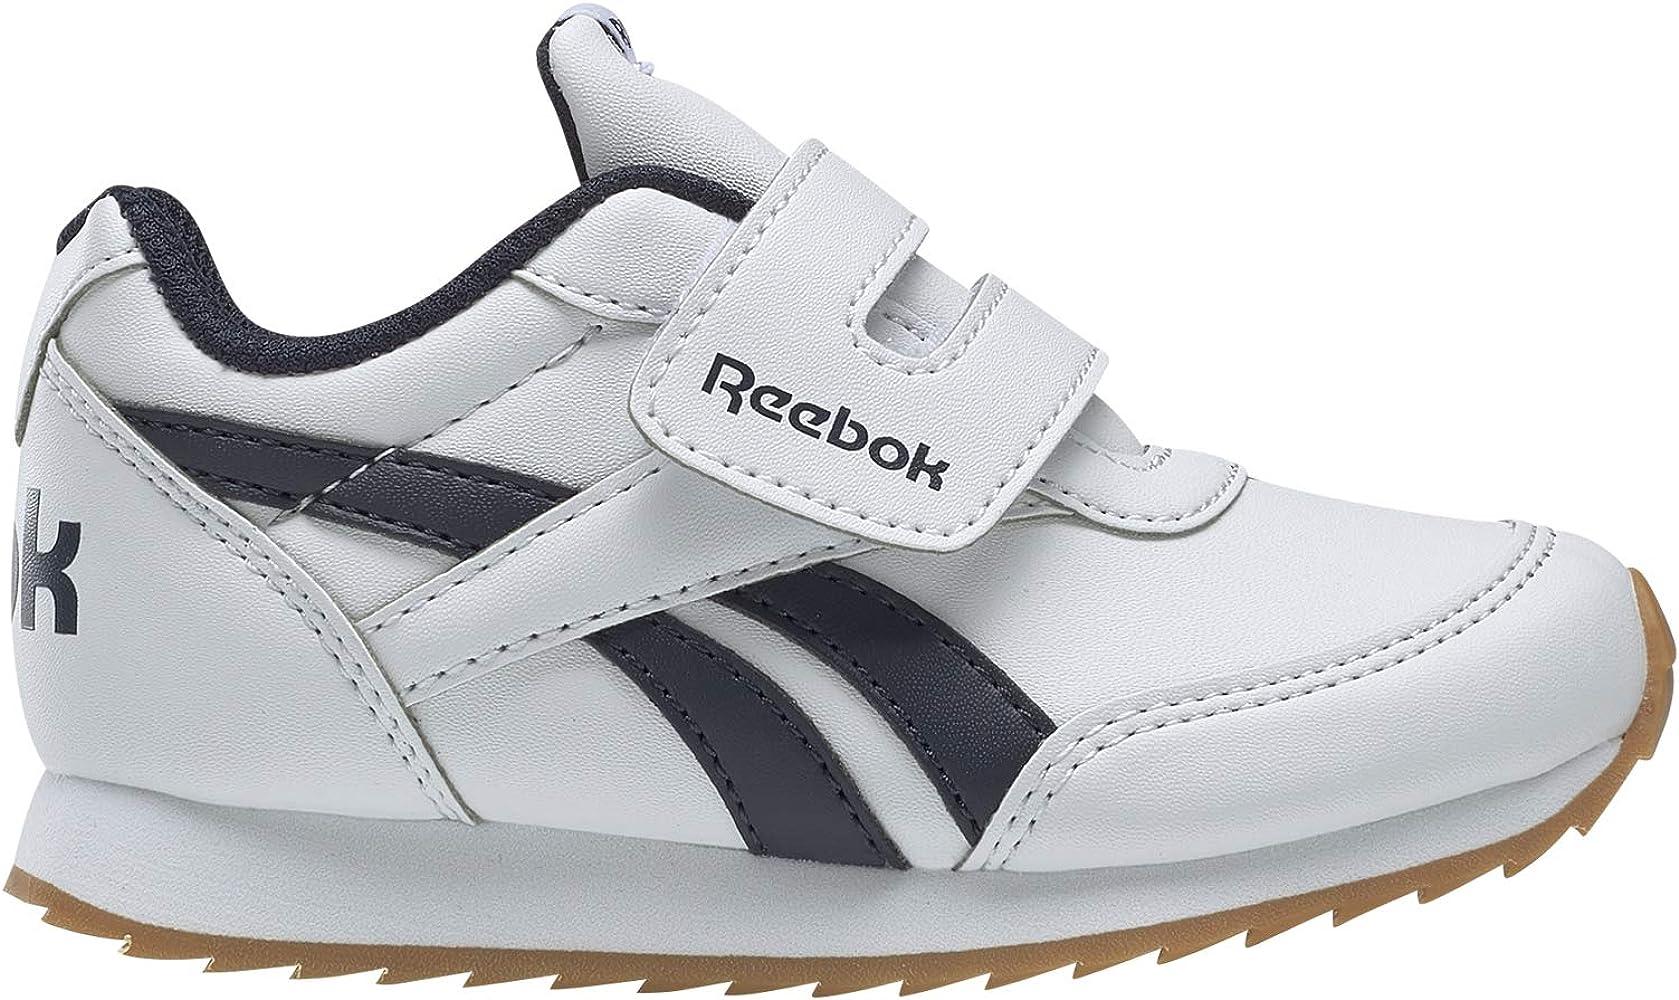 Zapatillas de Trail Running para Ni/ños Reebok Royal Cljog 2